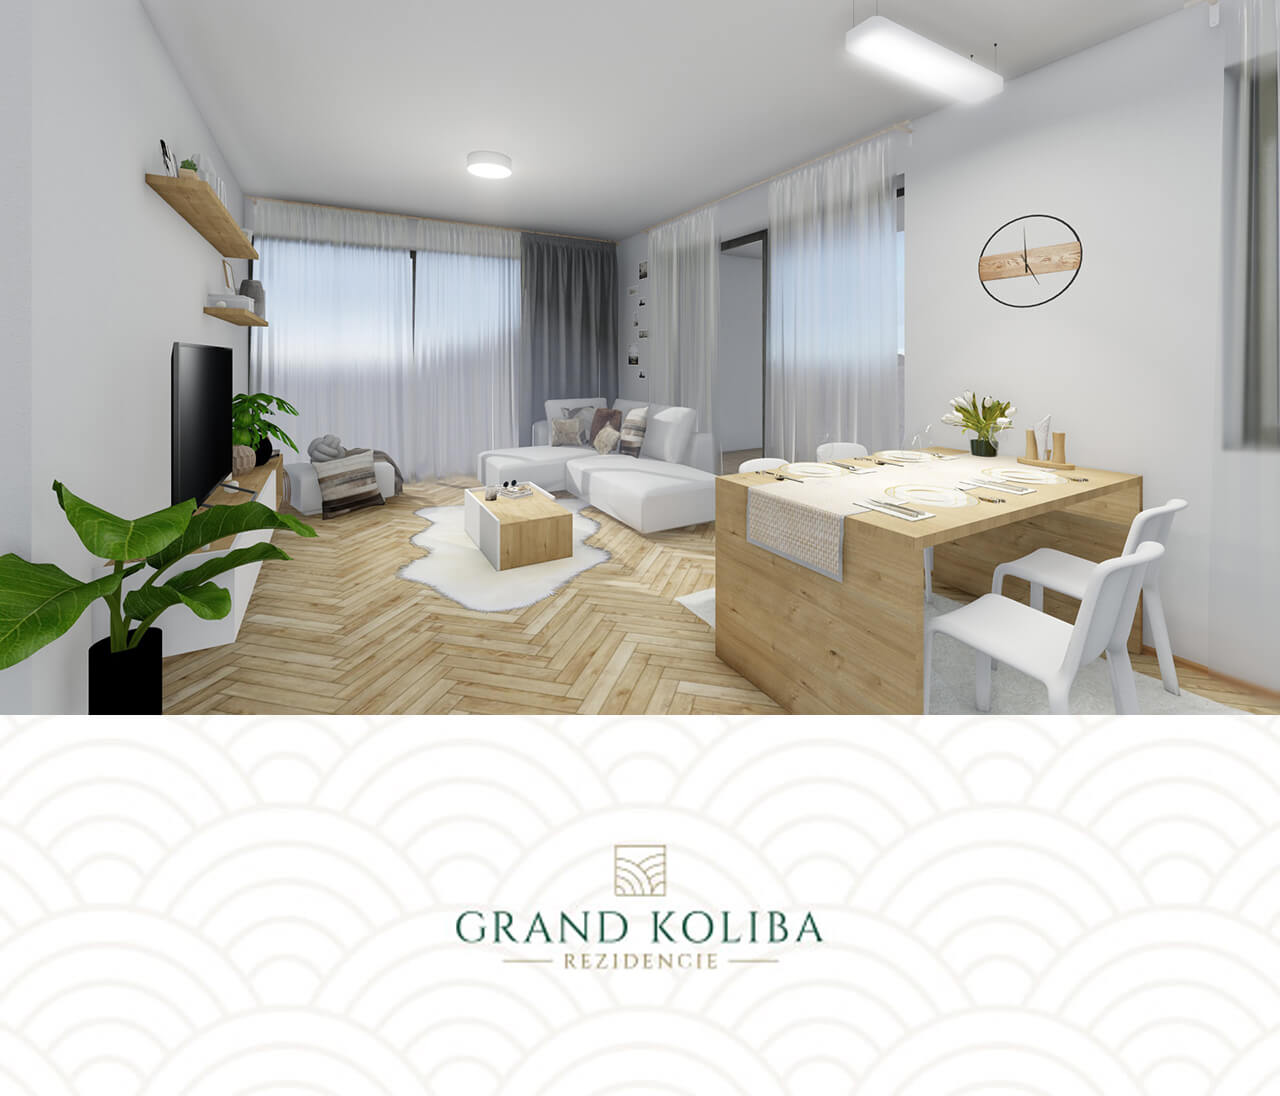 projekt Grand koliba